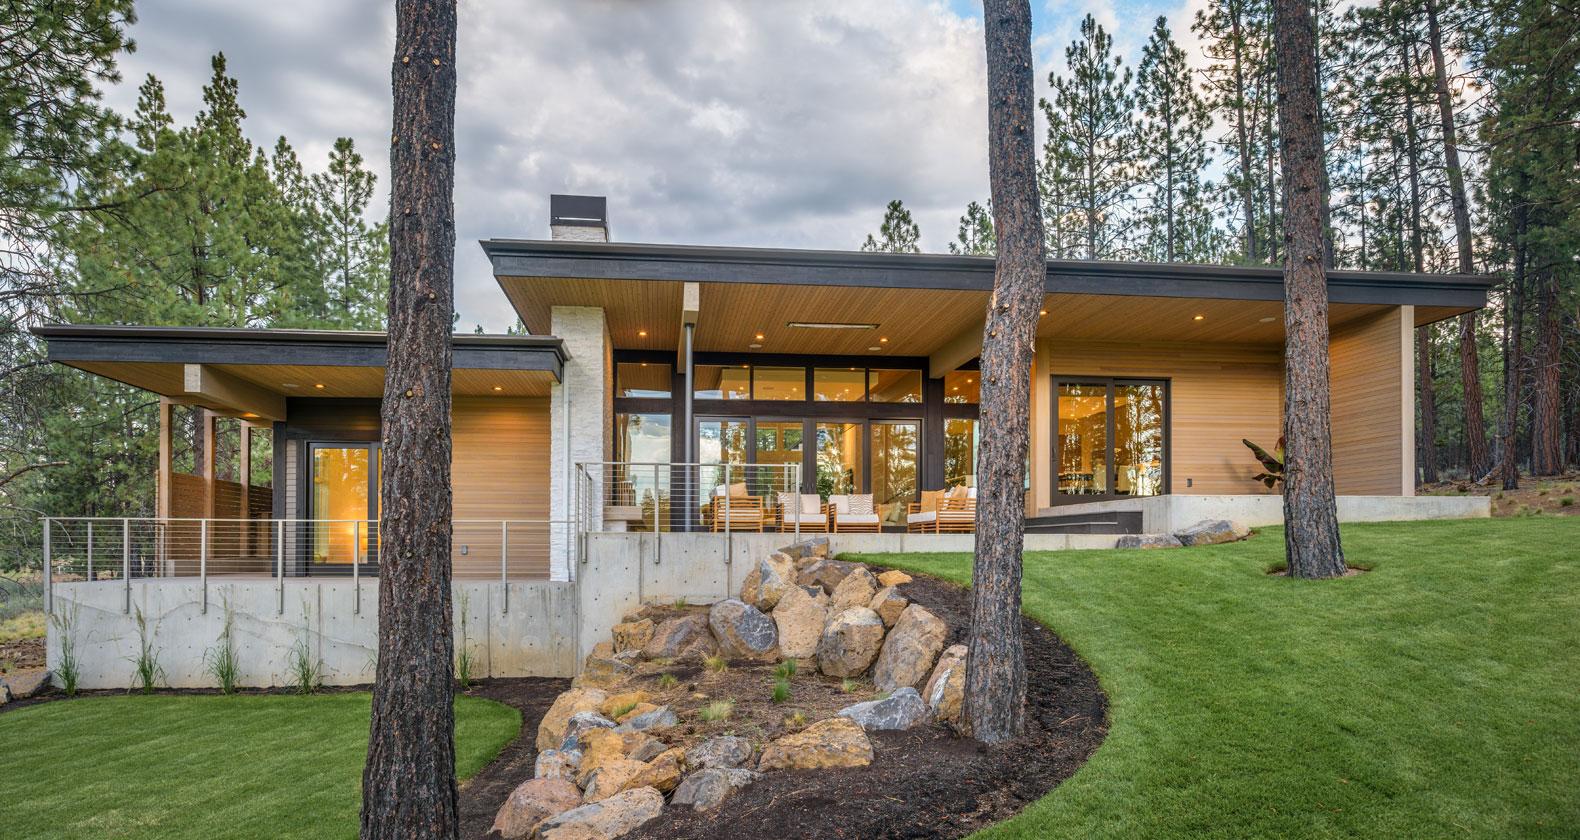 mid century modern modern architecture bend oregon tetherow golf dream home steel bridge mountain bike outdoor living